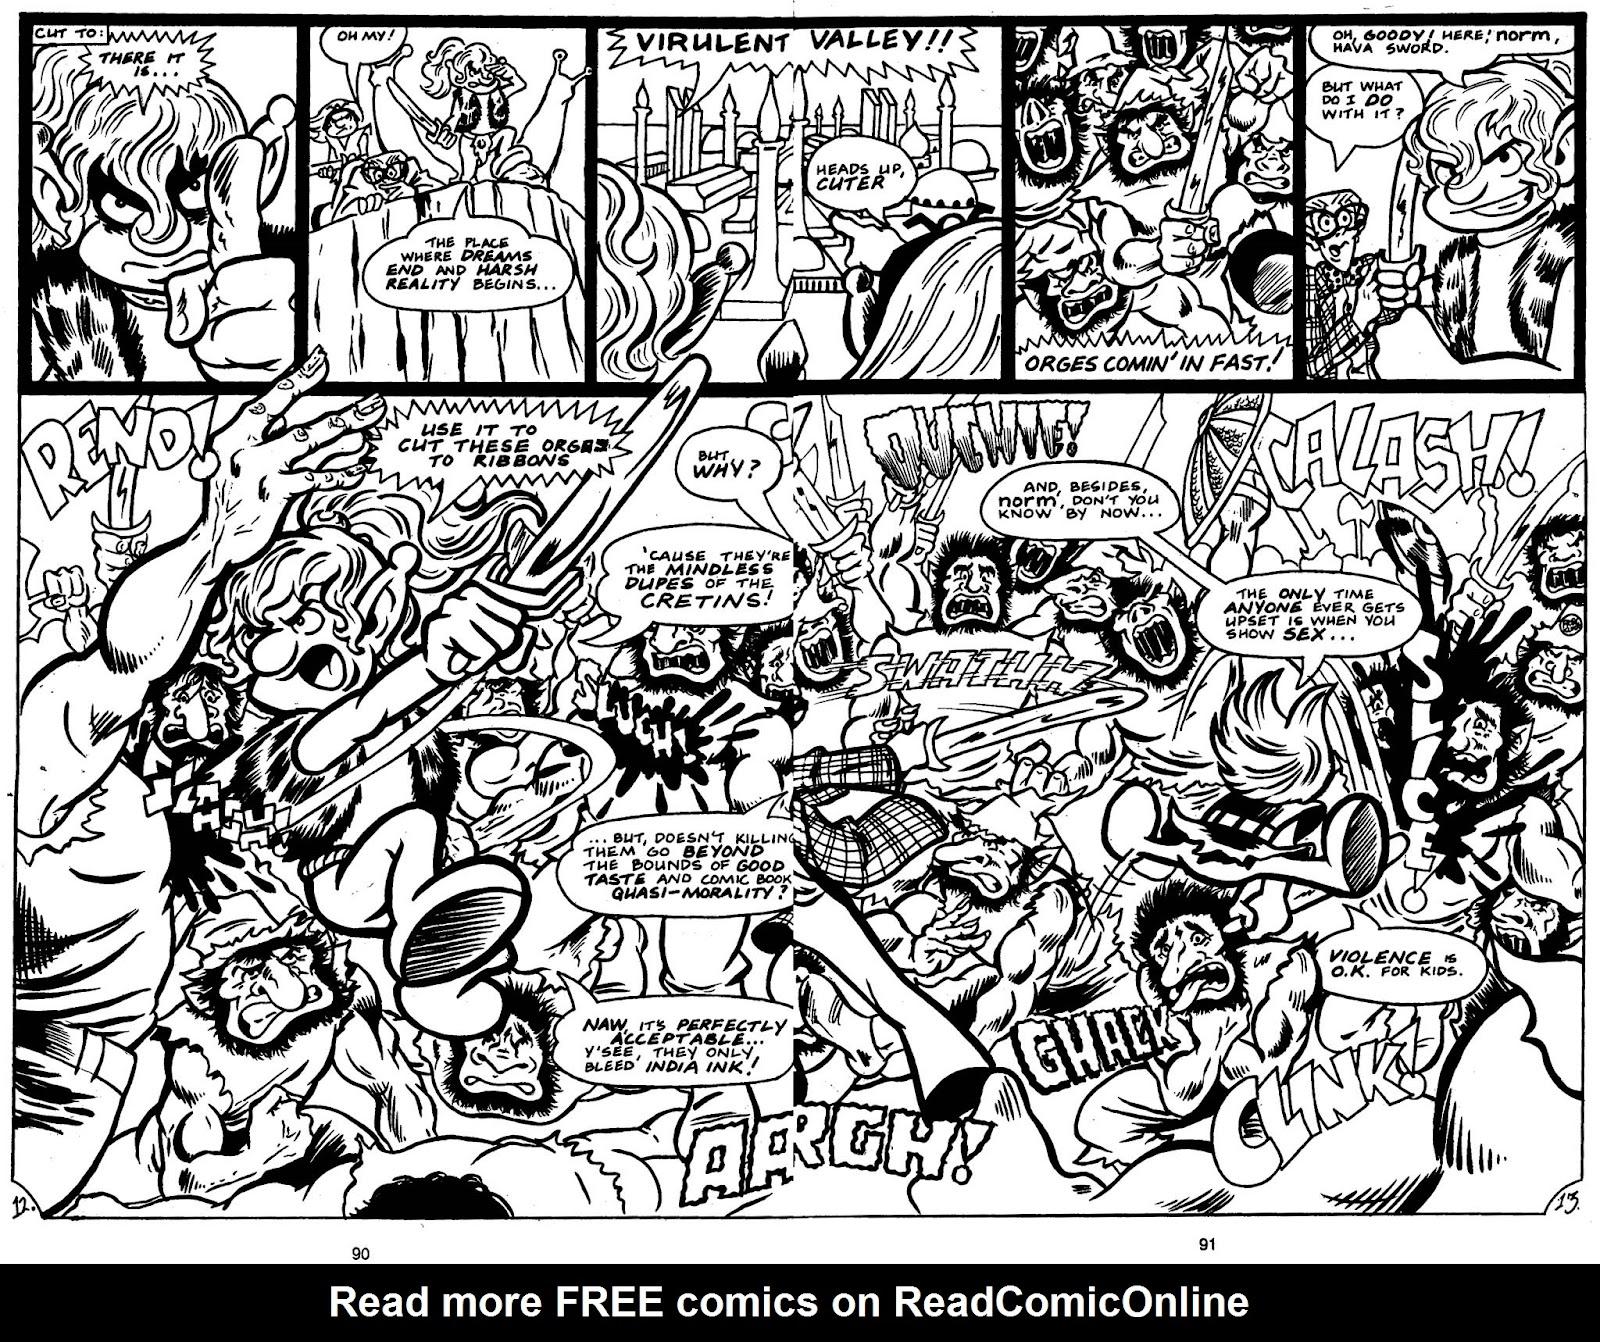 Read online Normalman - The Novel comic -  Issue # TPB (Part 1) - 93